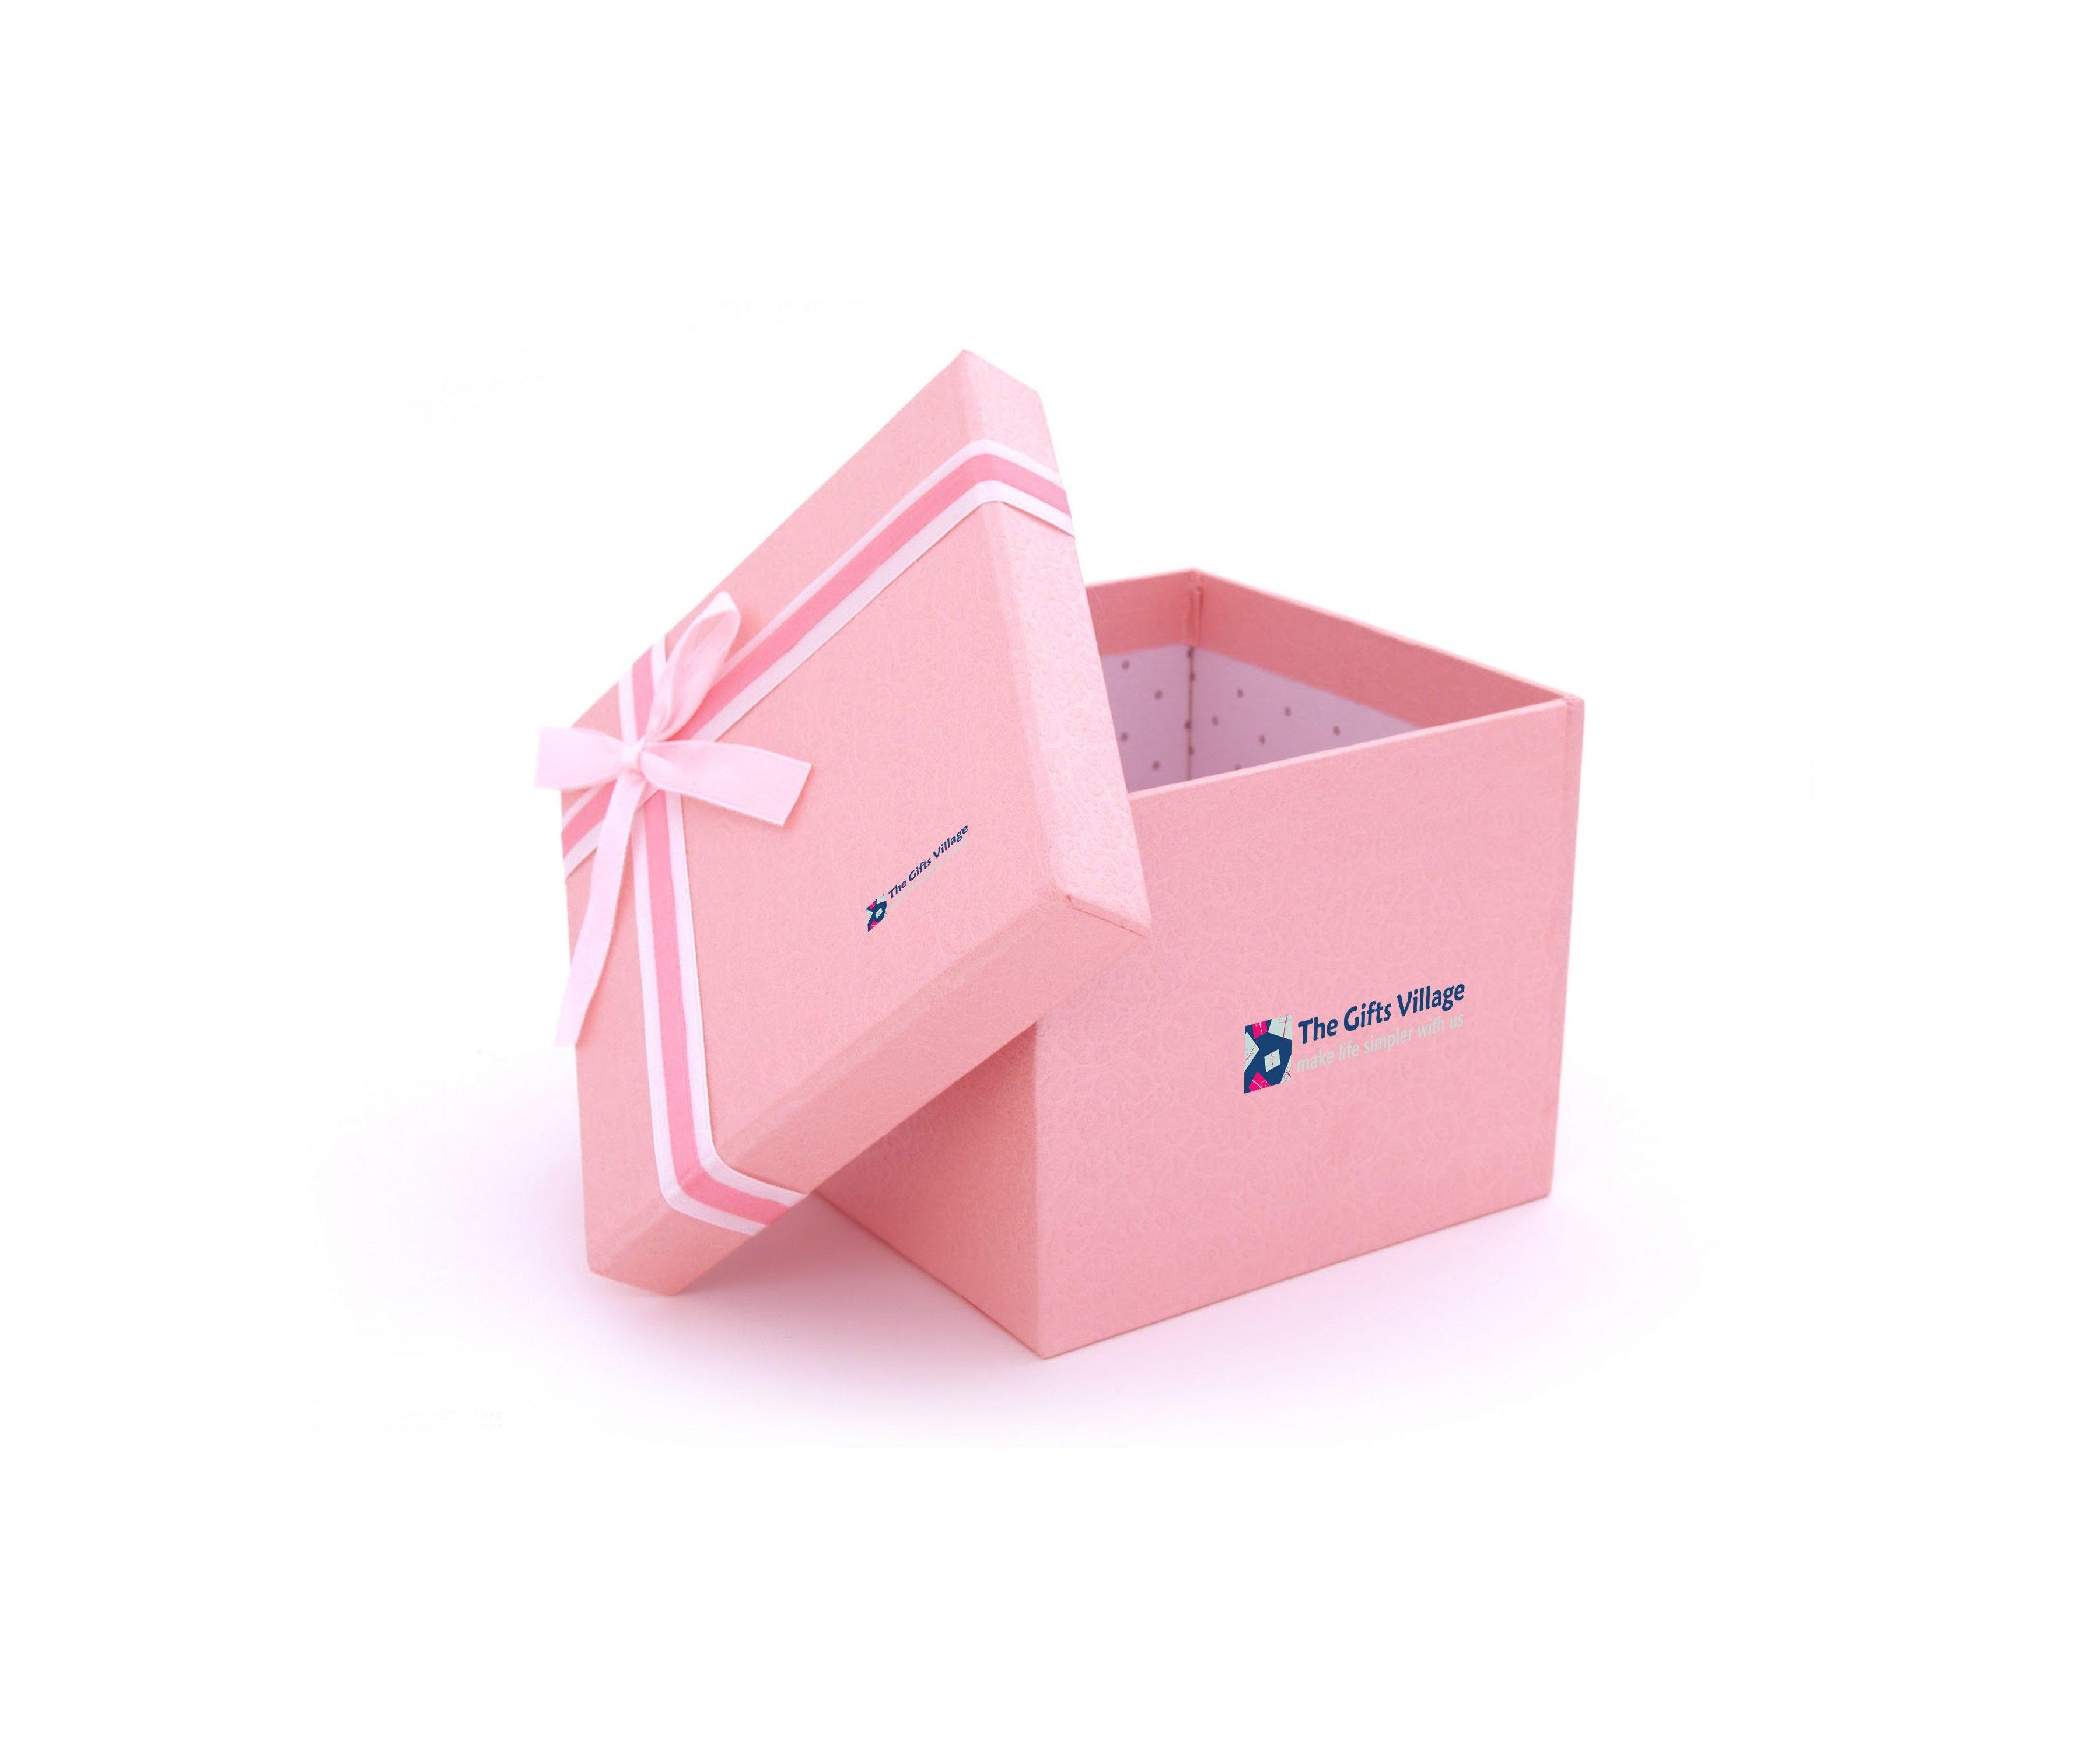 Thegiftsvillage Pink Gift Box